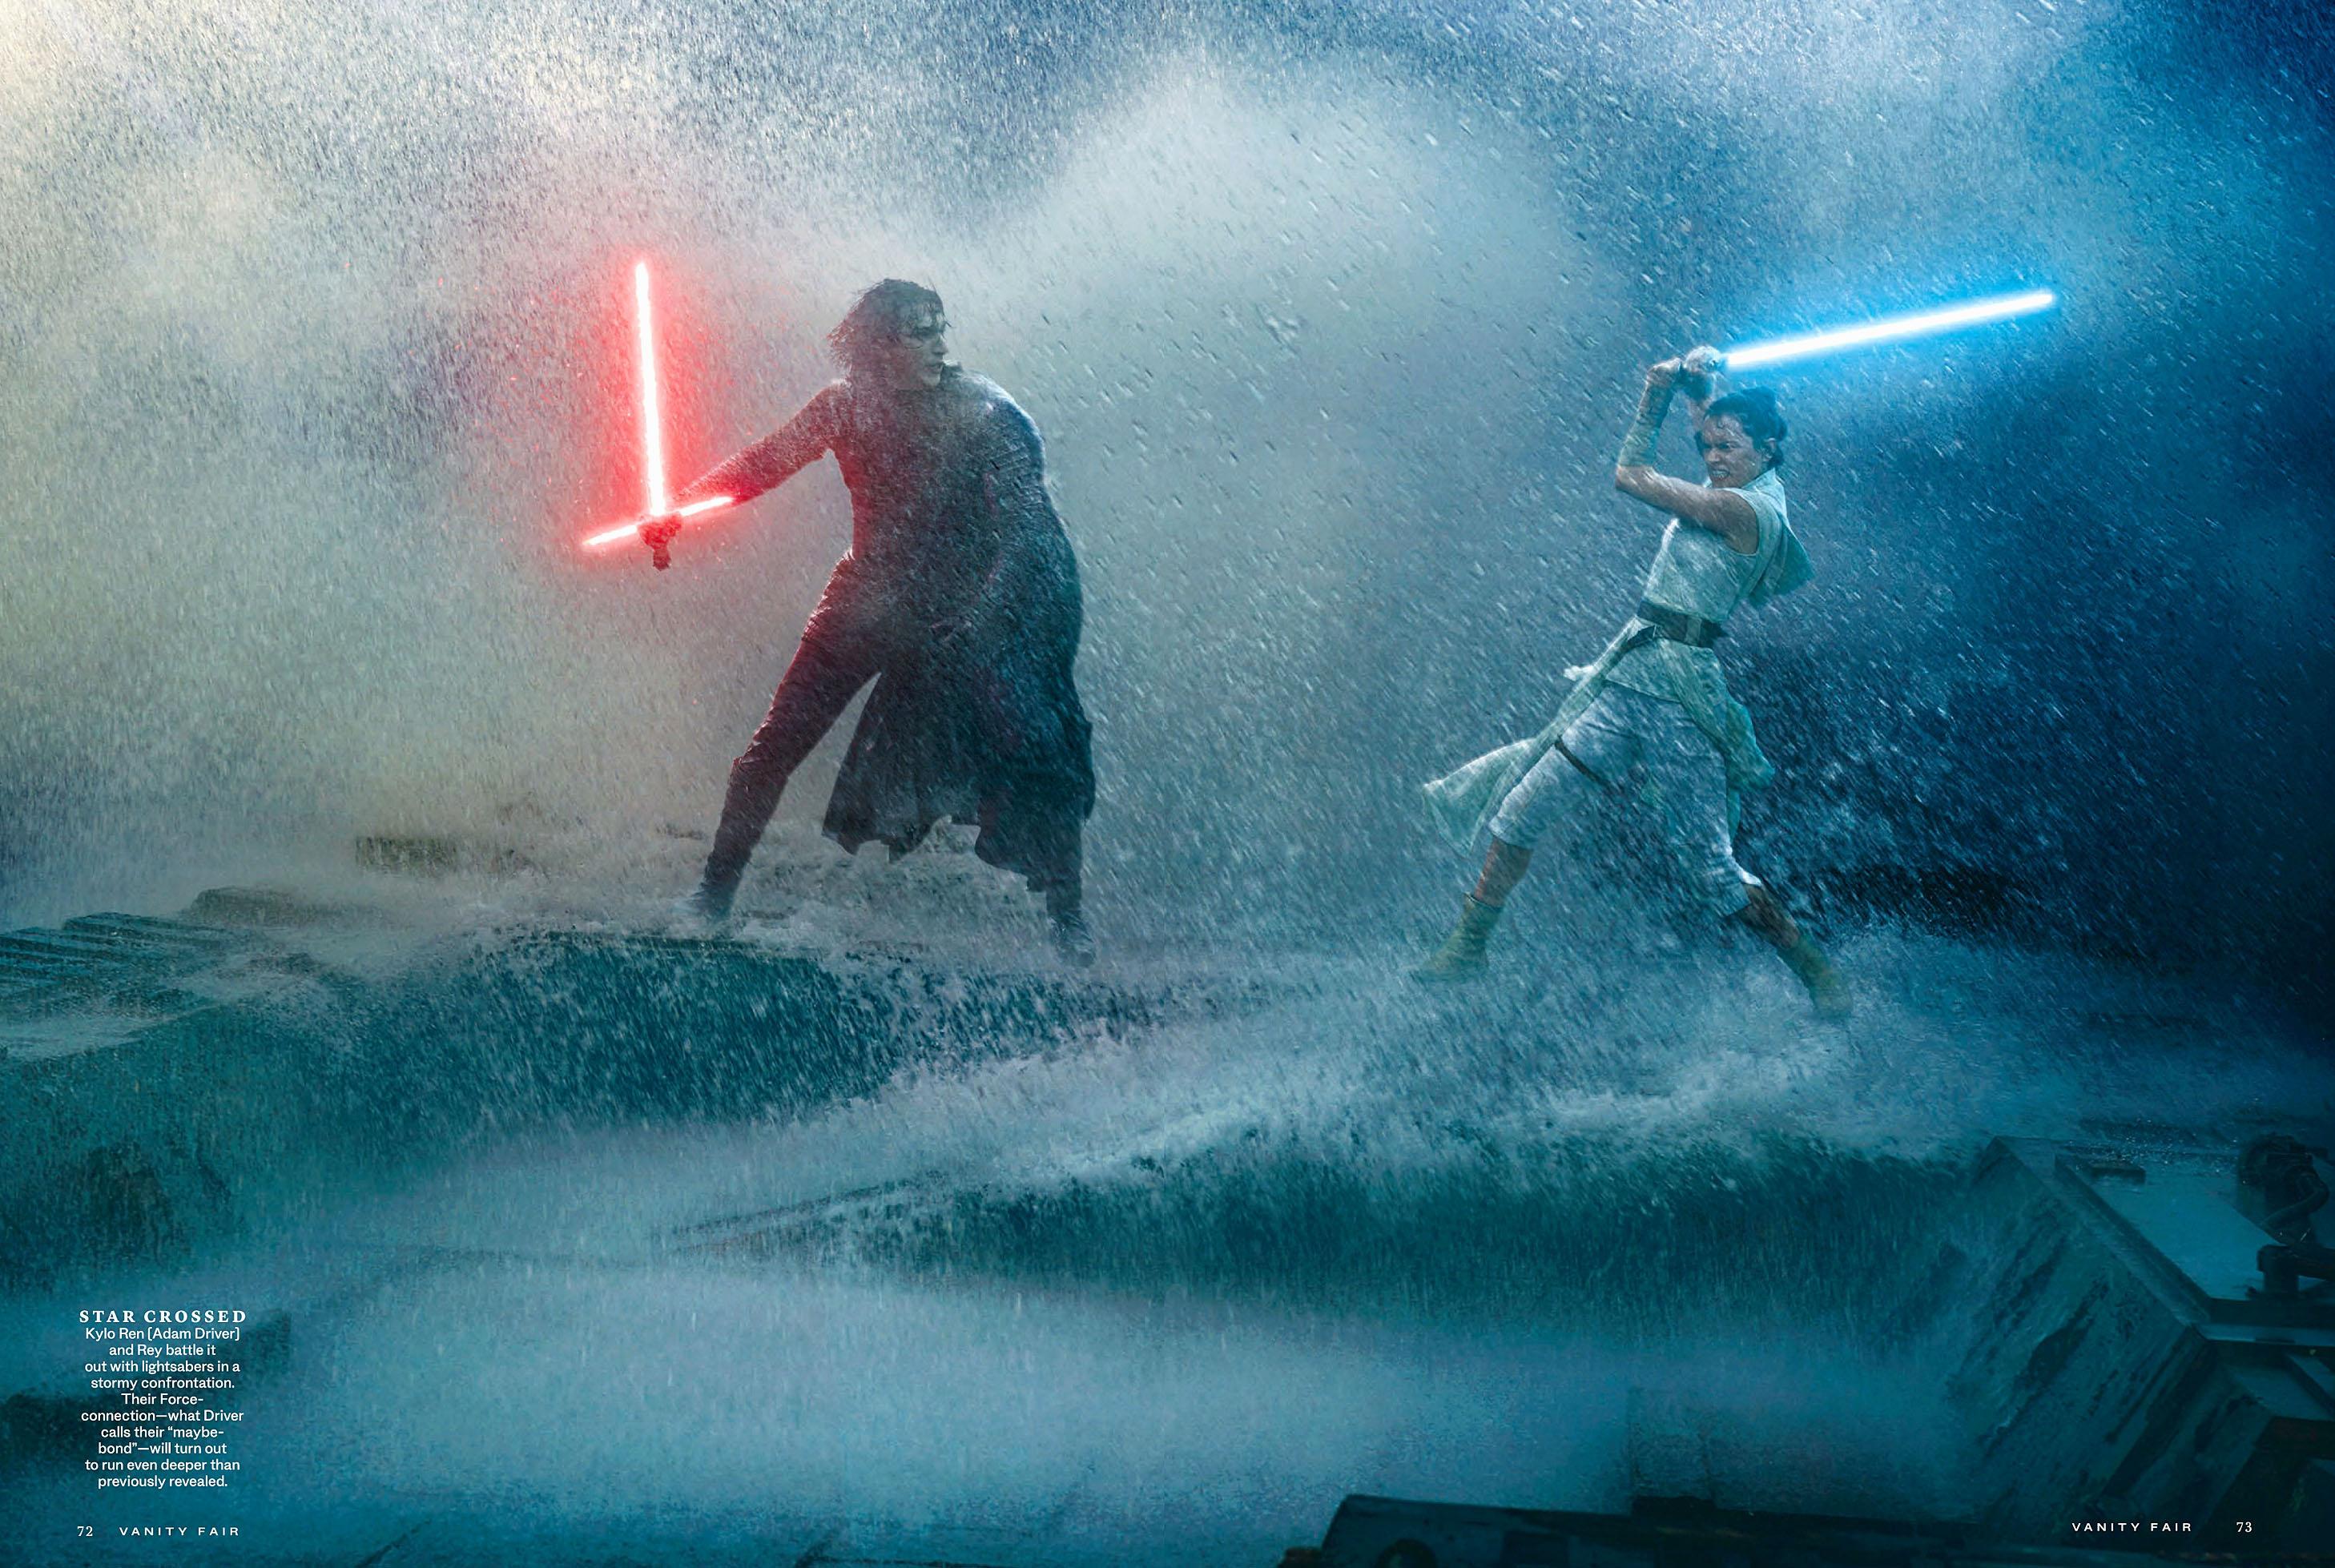 Vanity Fair Summer 2019 Star Wars06.jpg